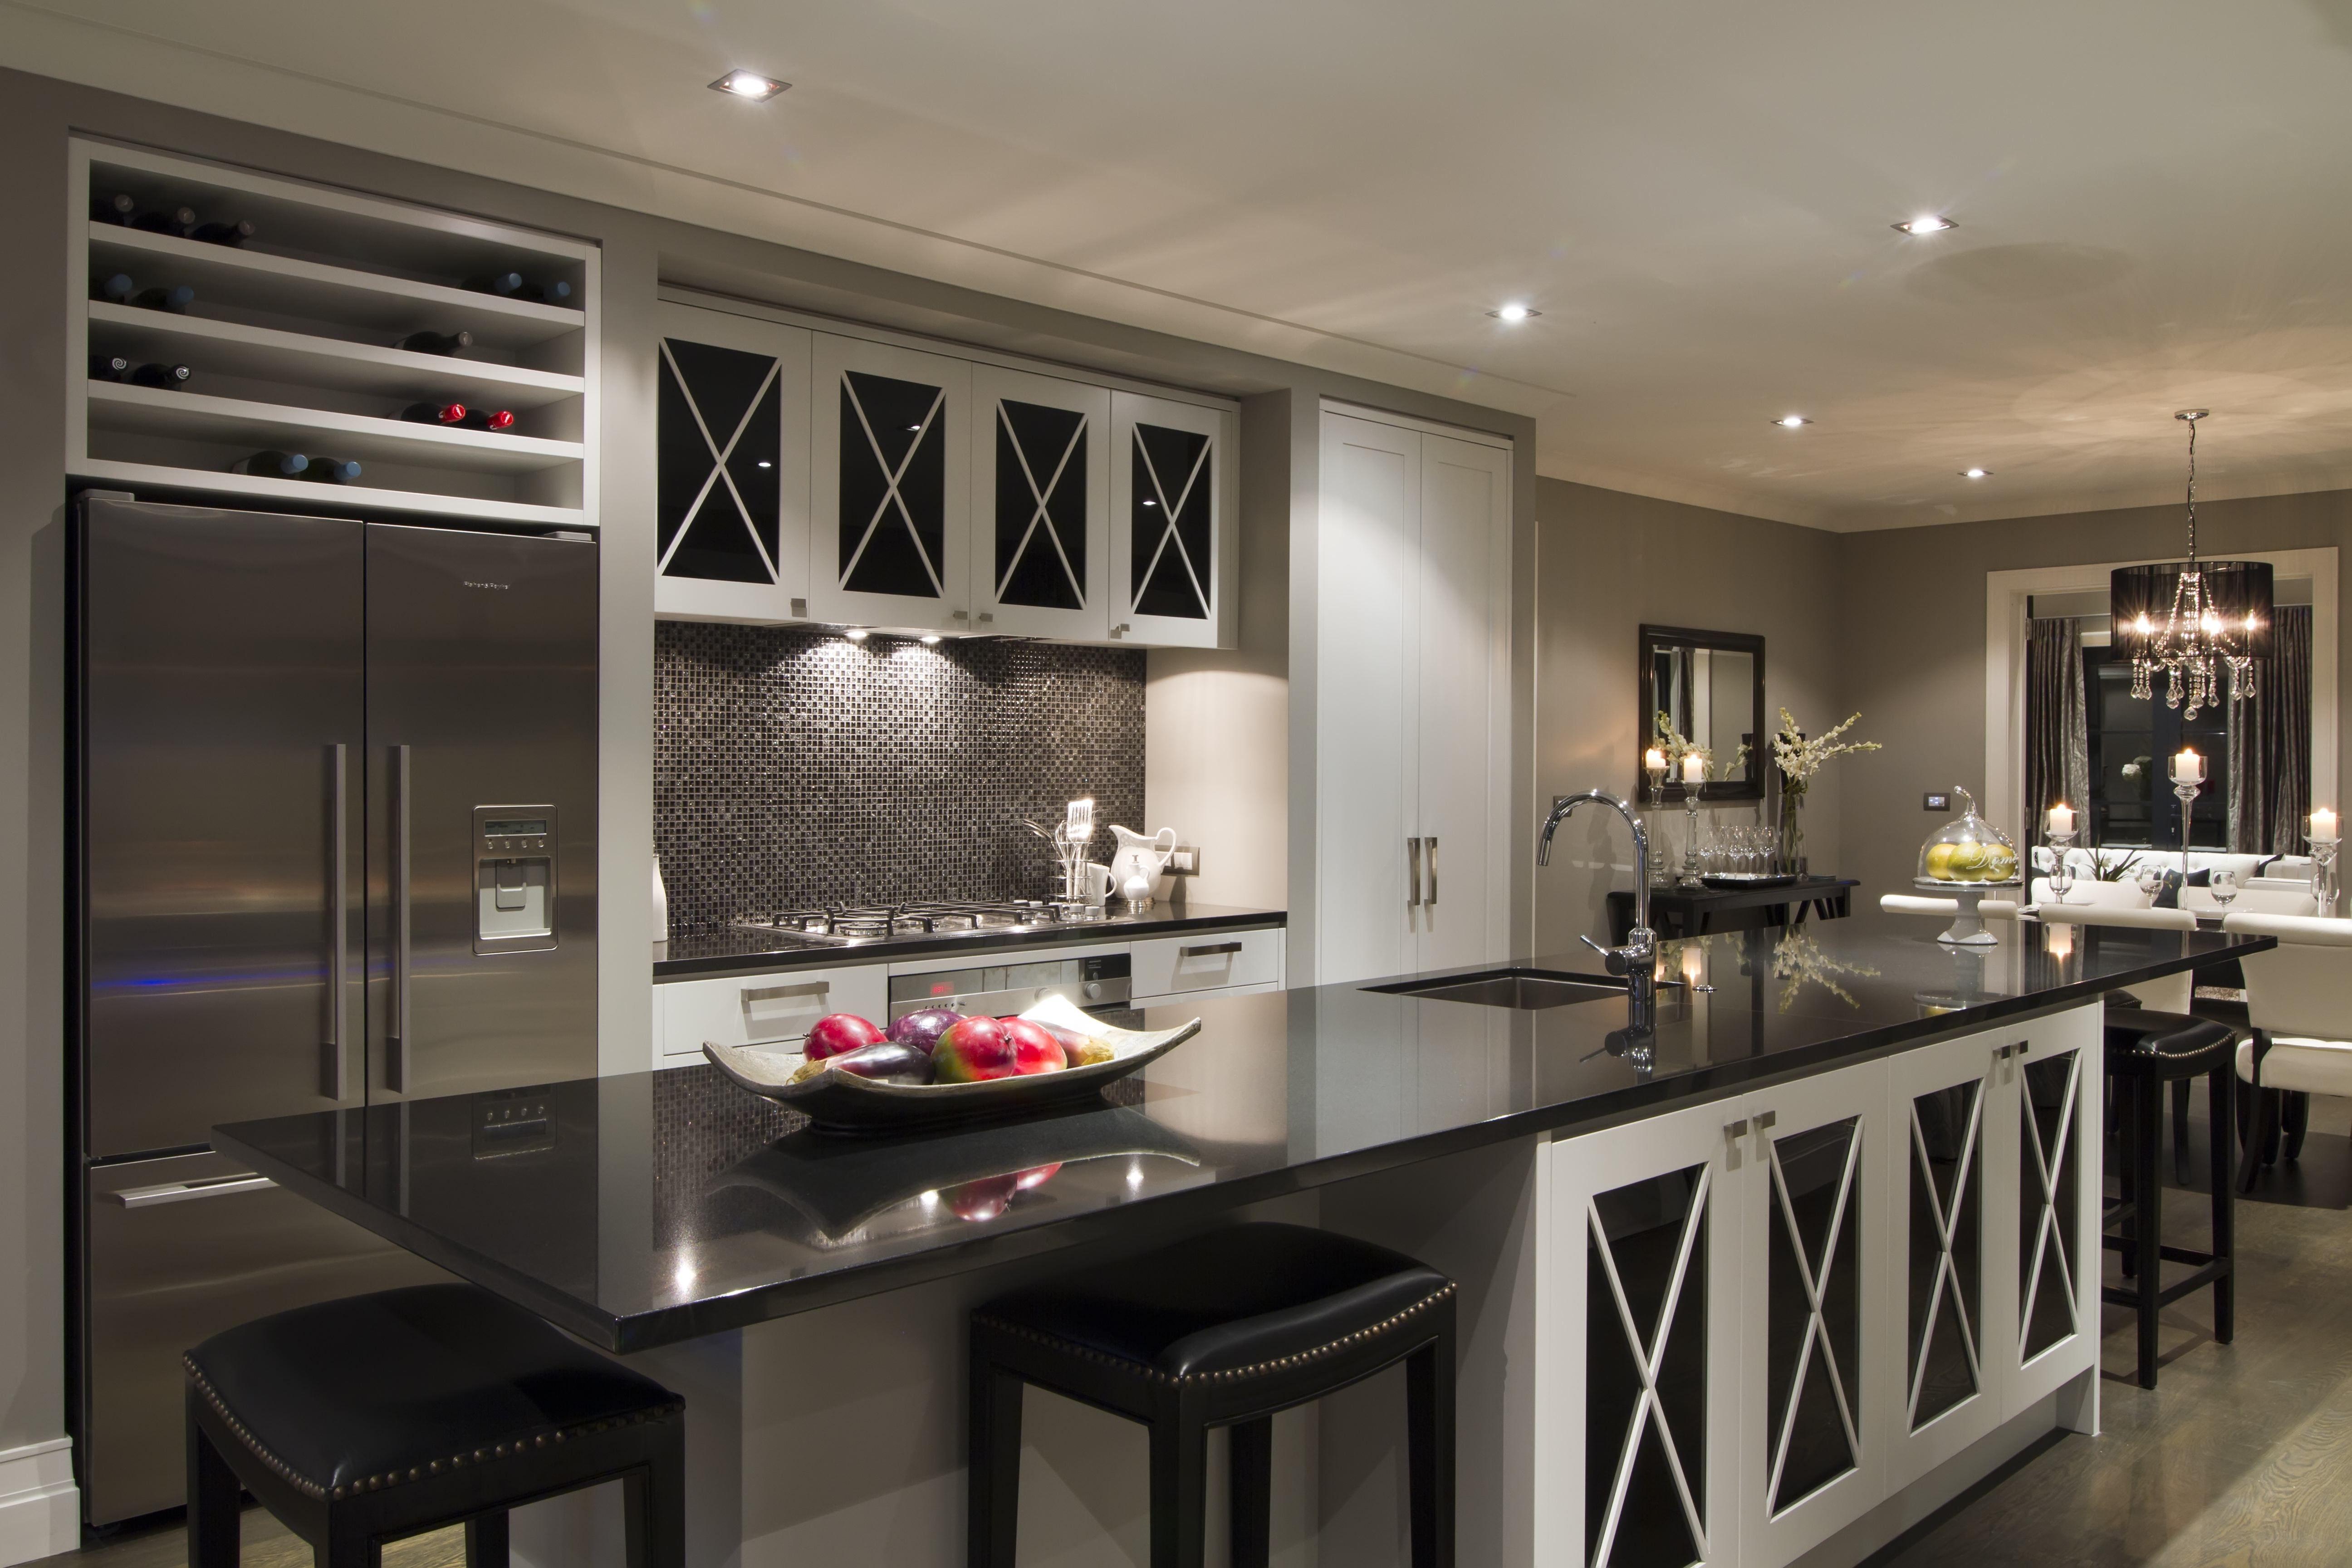 Traditional Albany Home designed by Masonry Design Solutions www.masonrydesign.co.nz